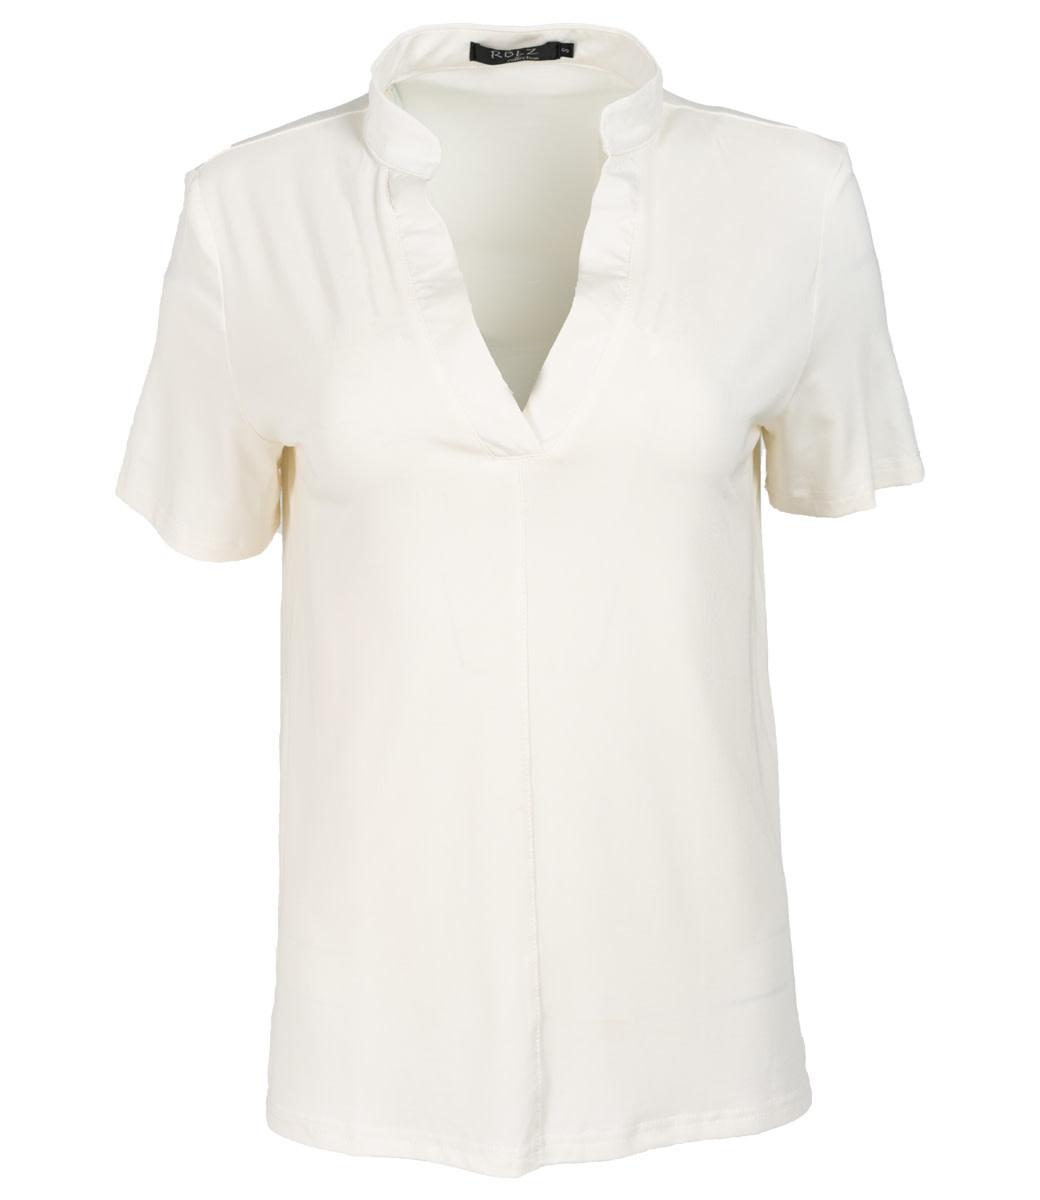 Rebelz Collection Shirt off white Aniek